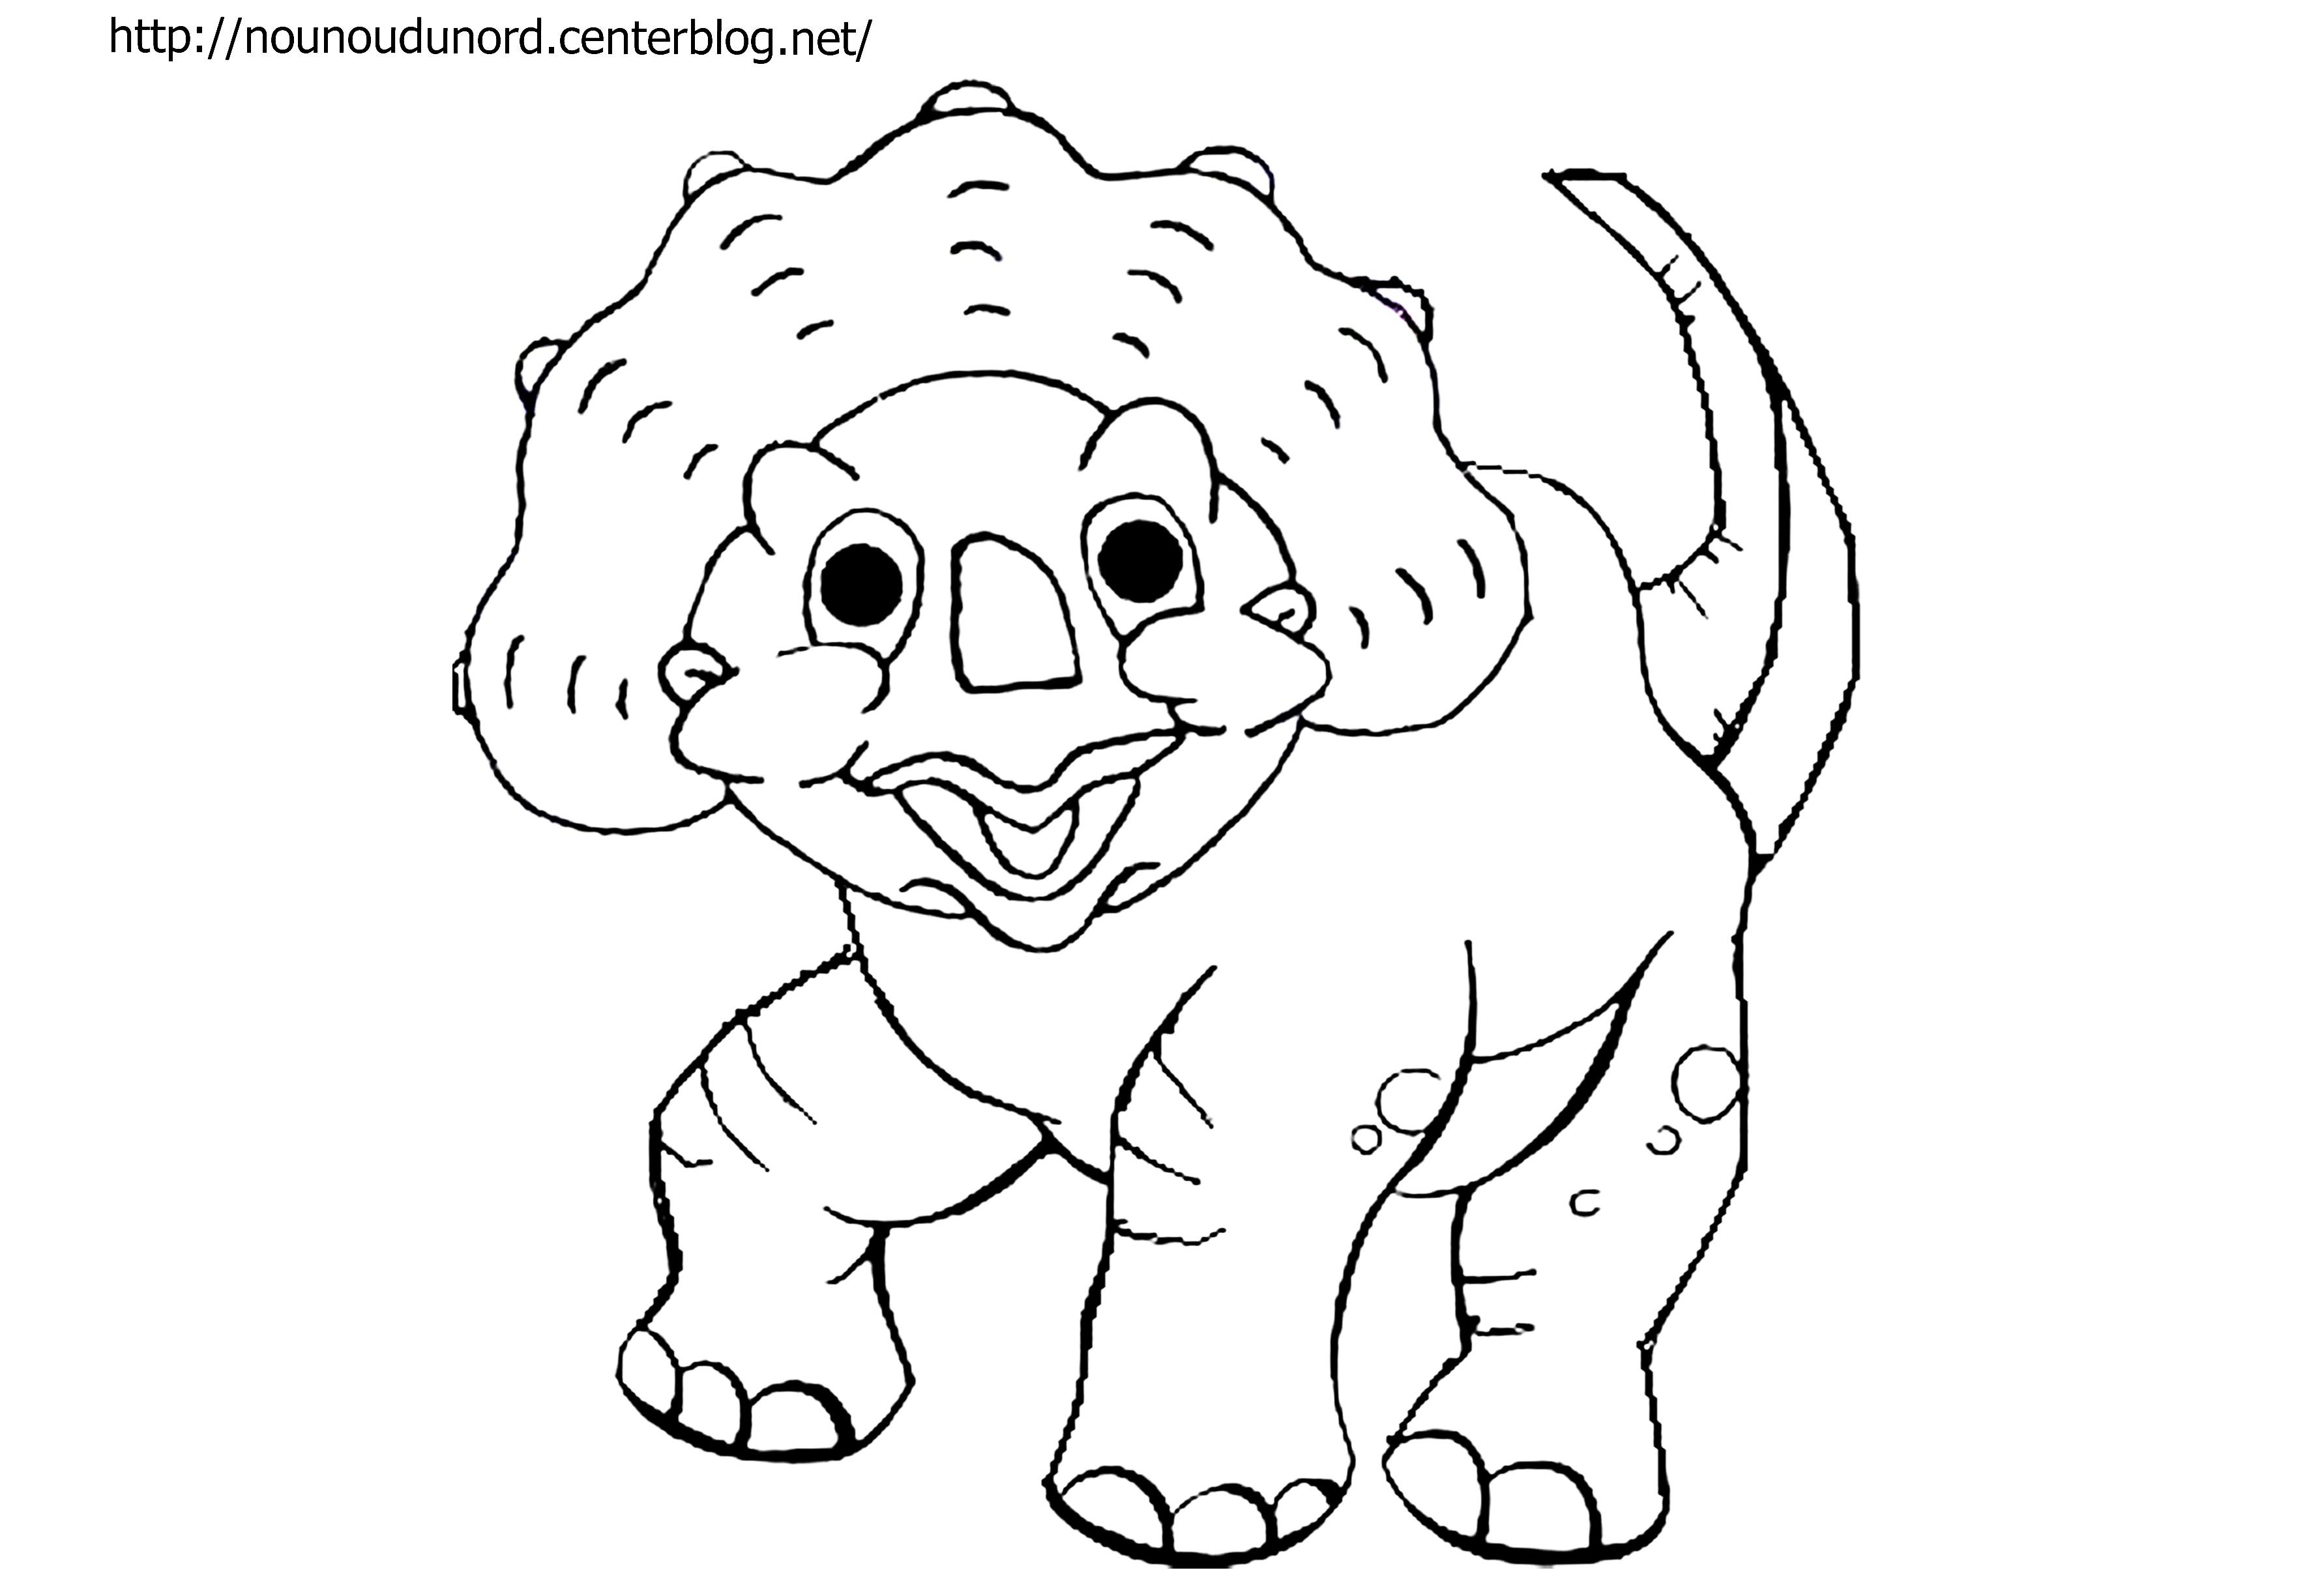 coloriage dessiner dinosaure lage de glace - Dessin Colorier Imprimer